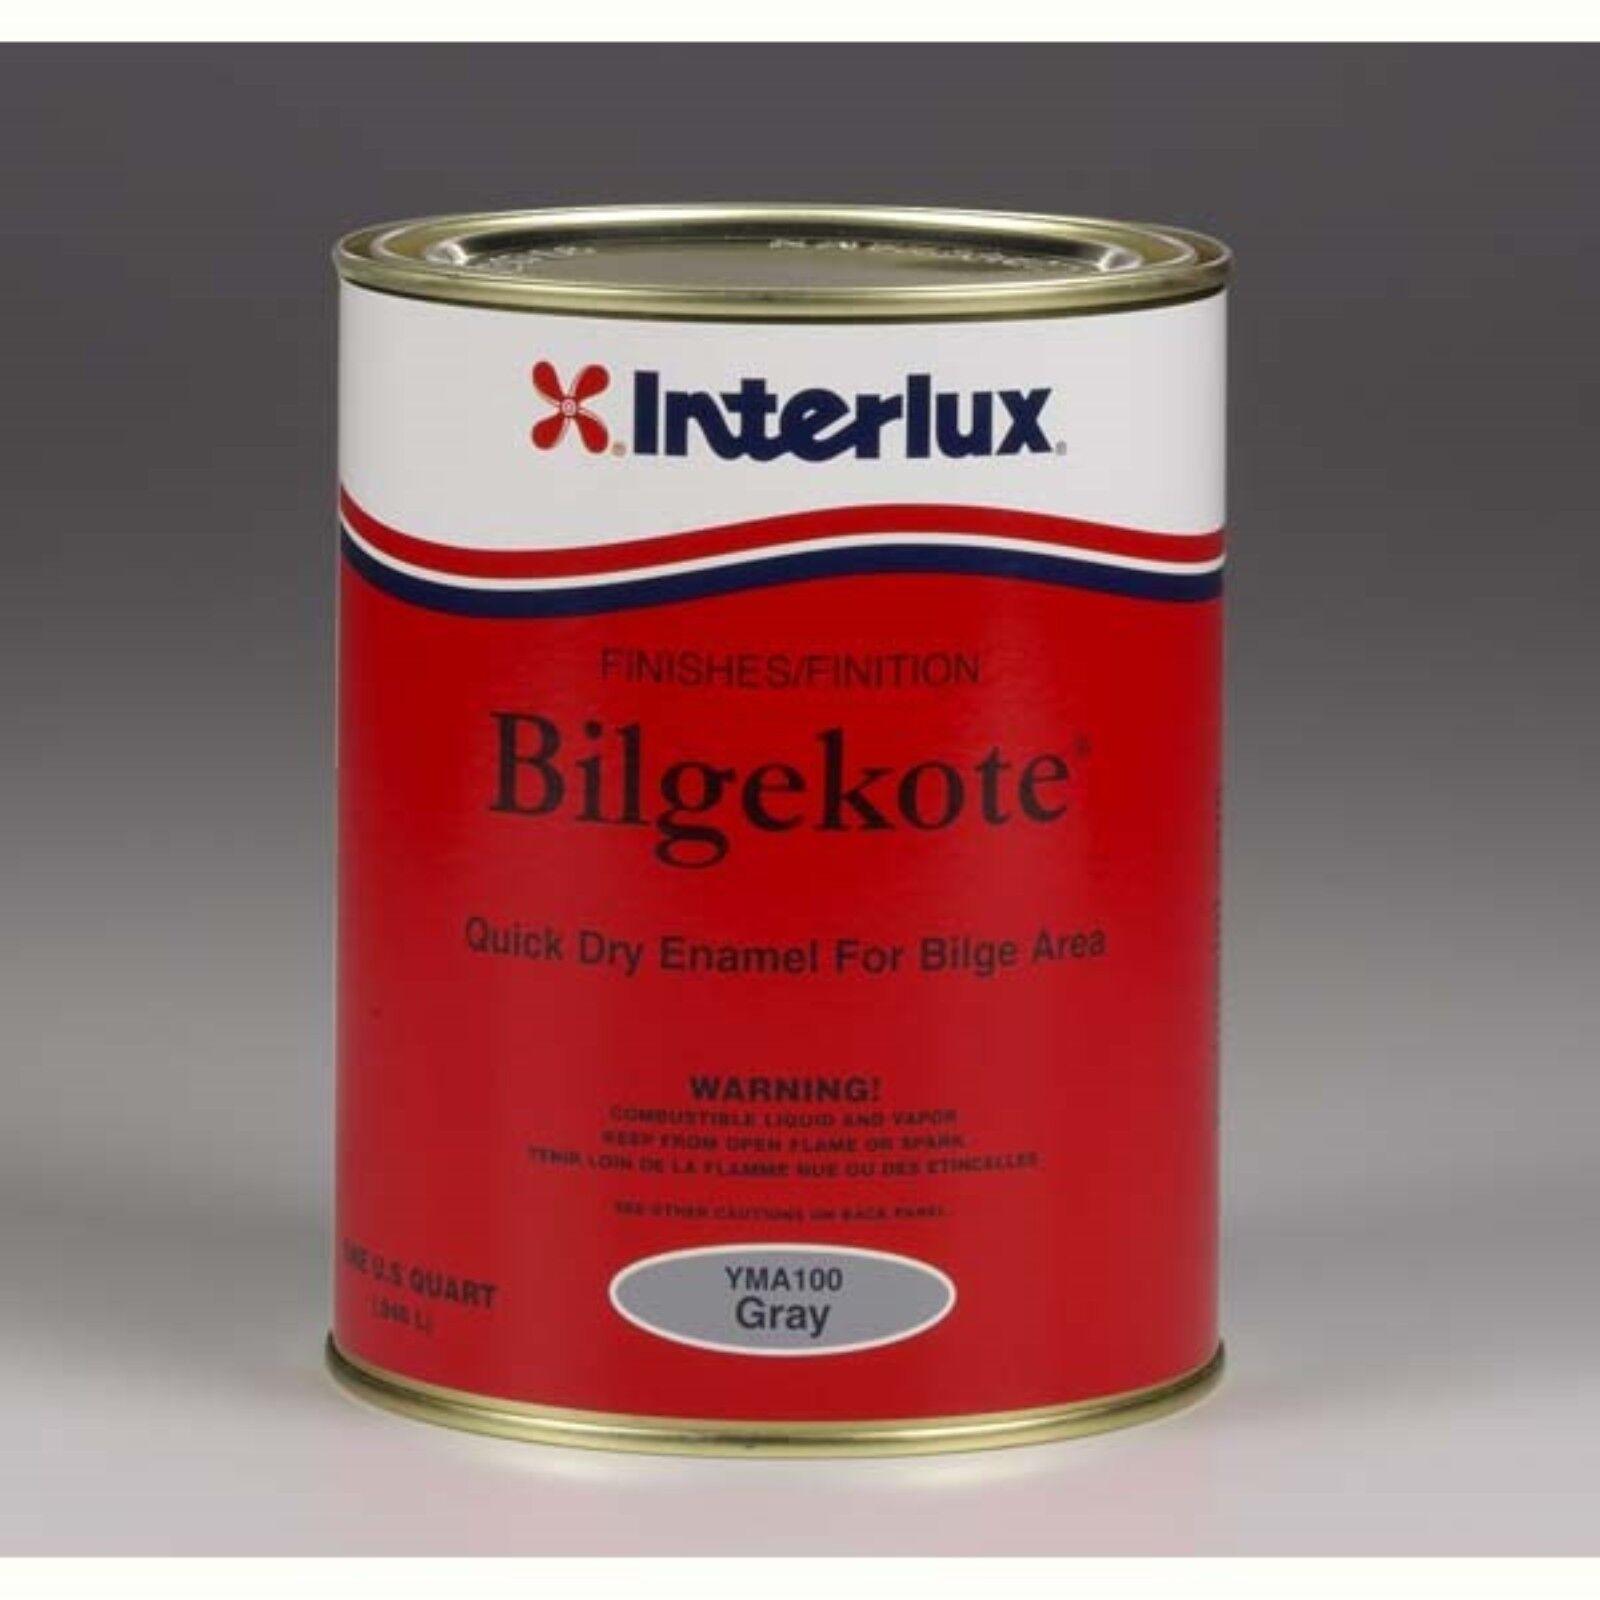 Interlux Bilgekote Fast Dry Bilge Enamel - WHITE QUART